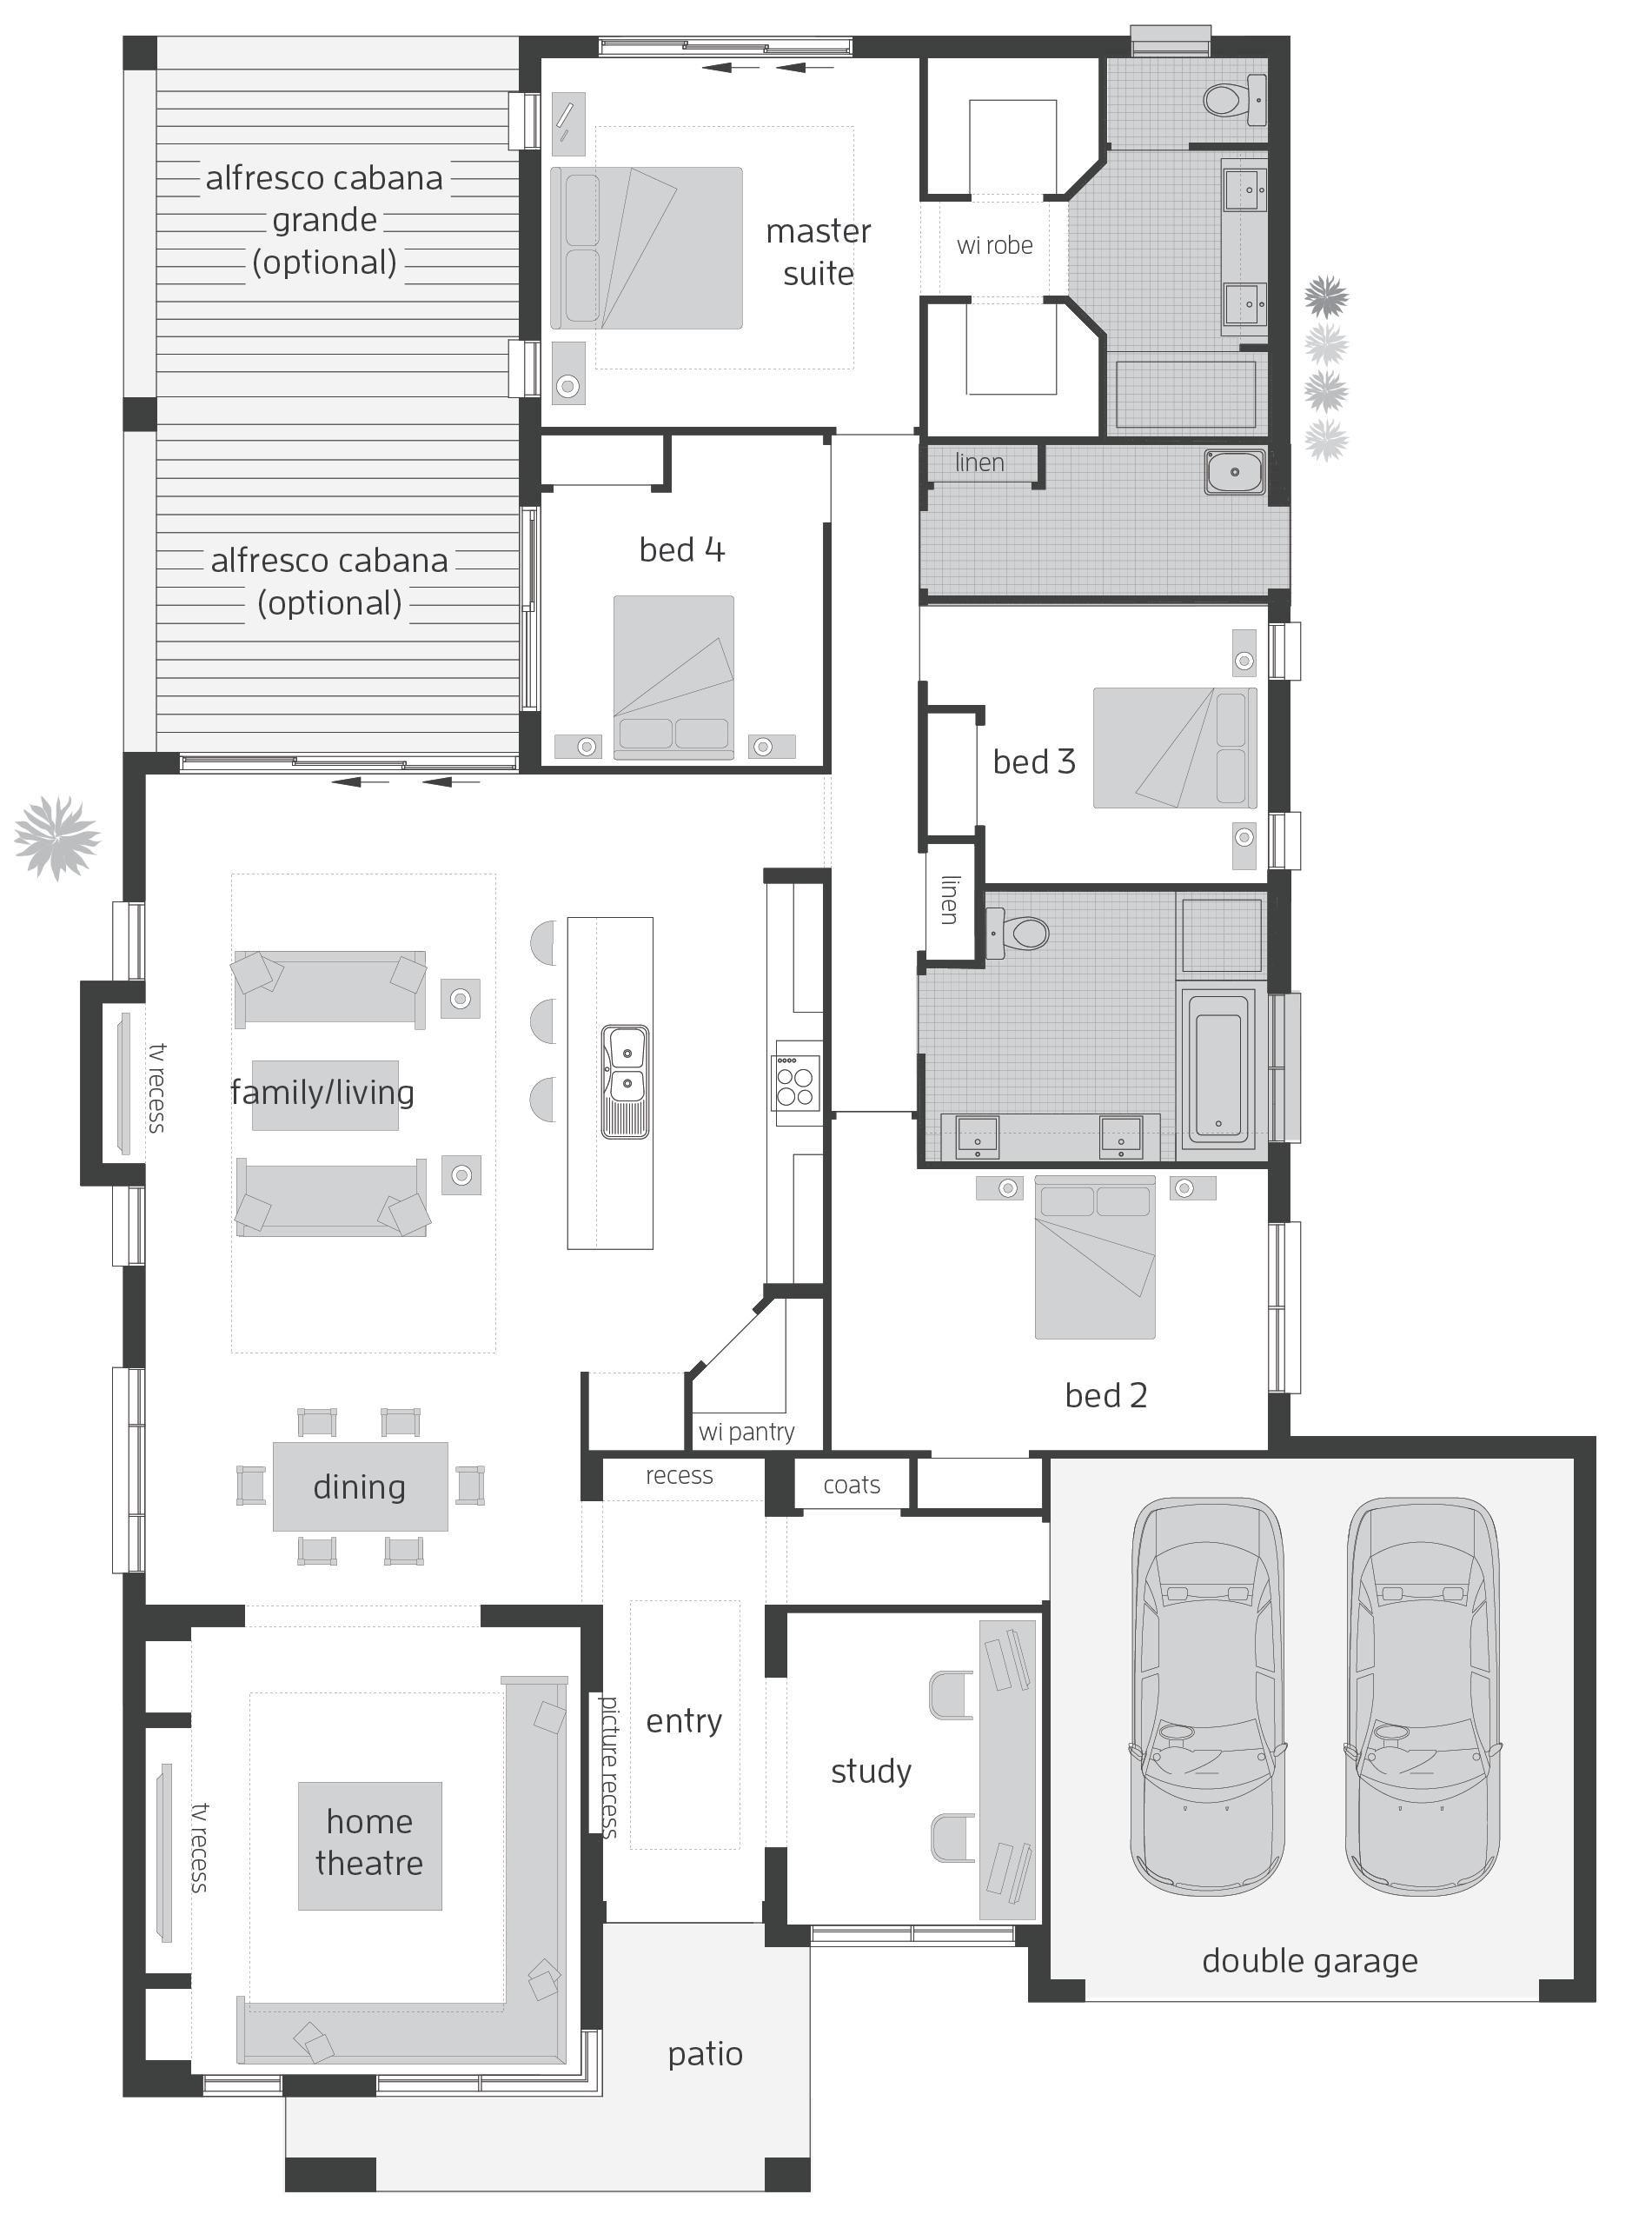 Monte Carlo Floorplans House Plans Australia Floor Plans New House Plans